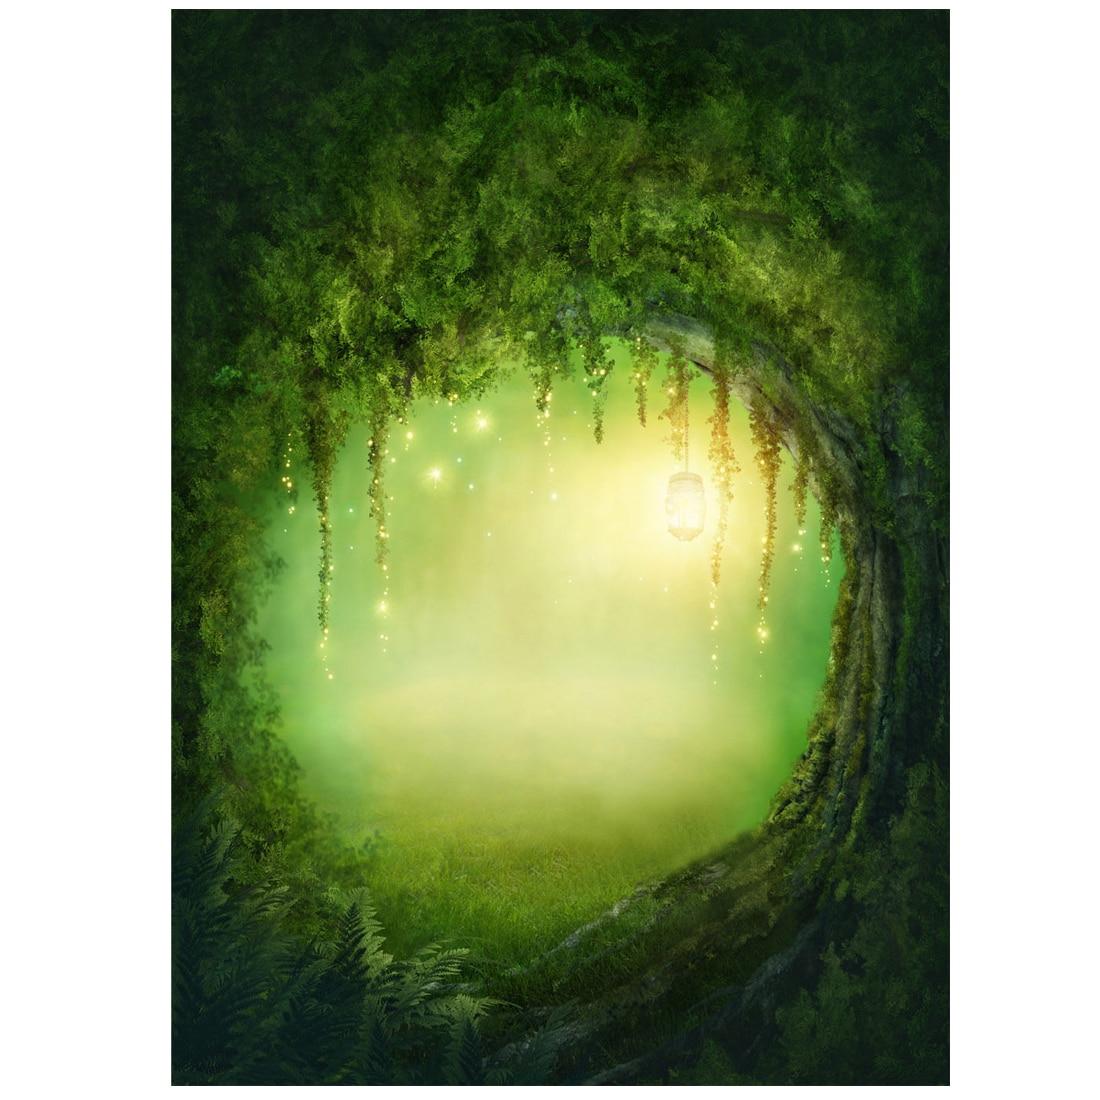 3X5FT Vinyl Studio Backdrop Photography Fairy Tale Forest Photo Background Green send rolled enchanted forest backdrop secret garden lantern fairy tale printed fabric photography background s0038